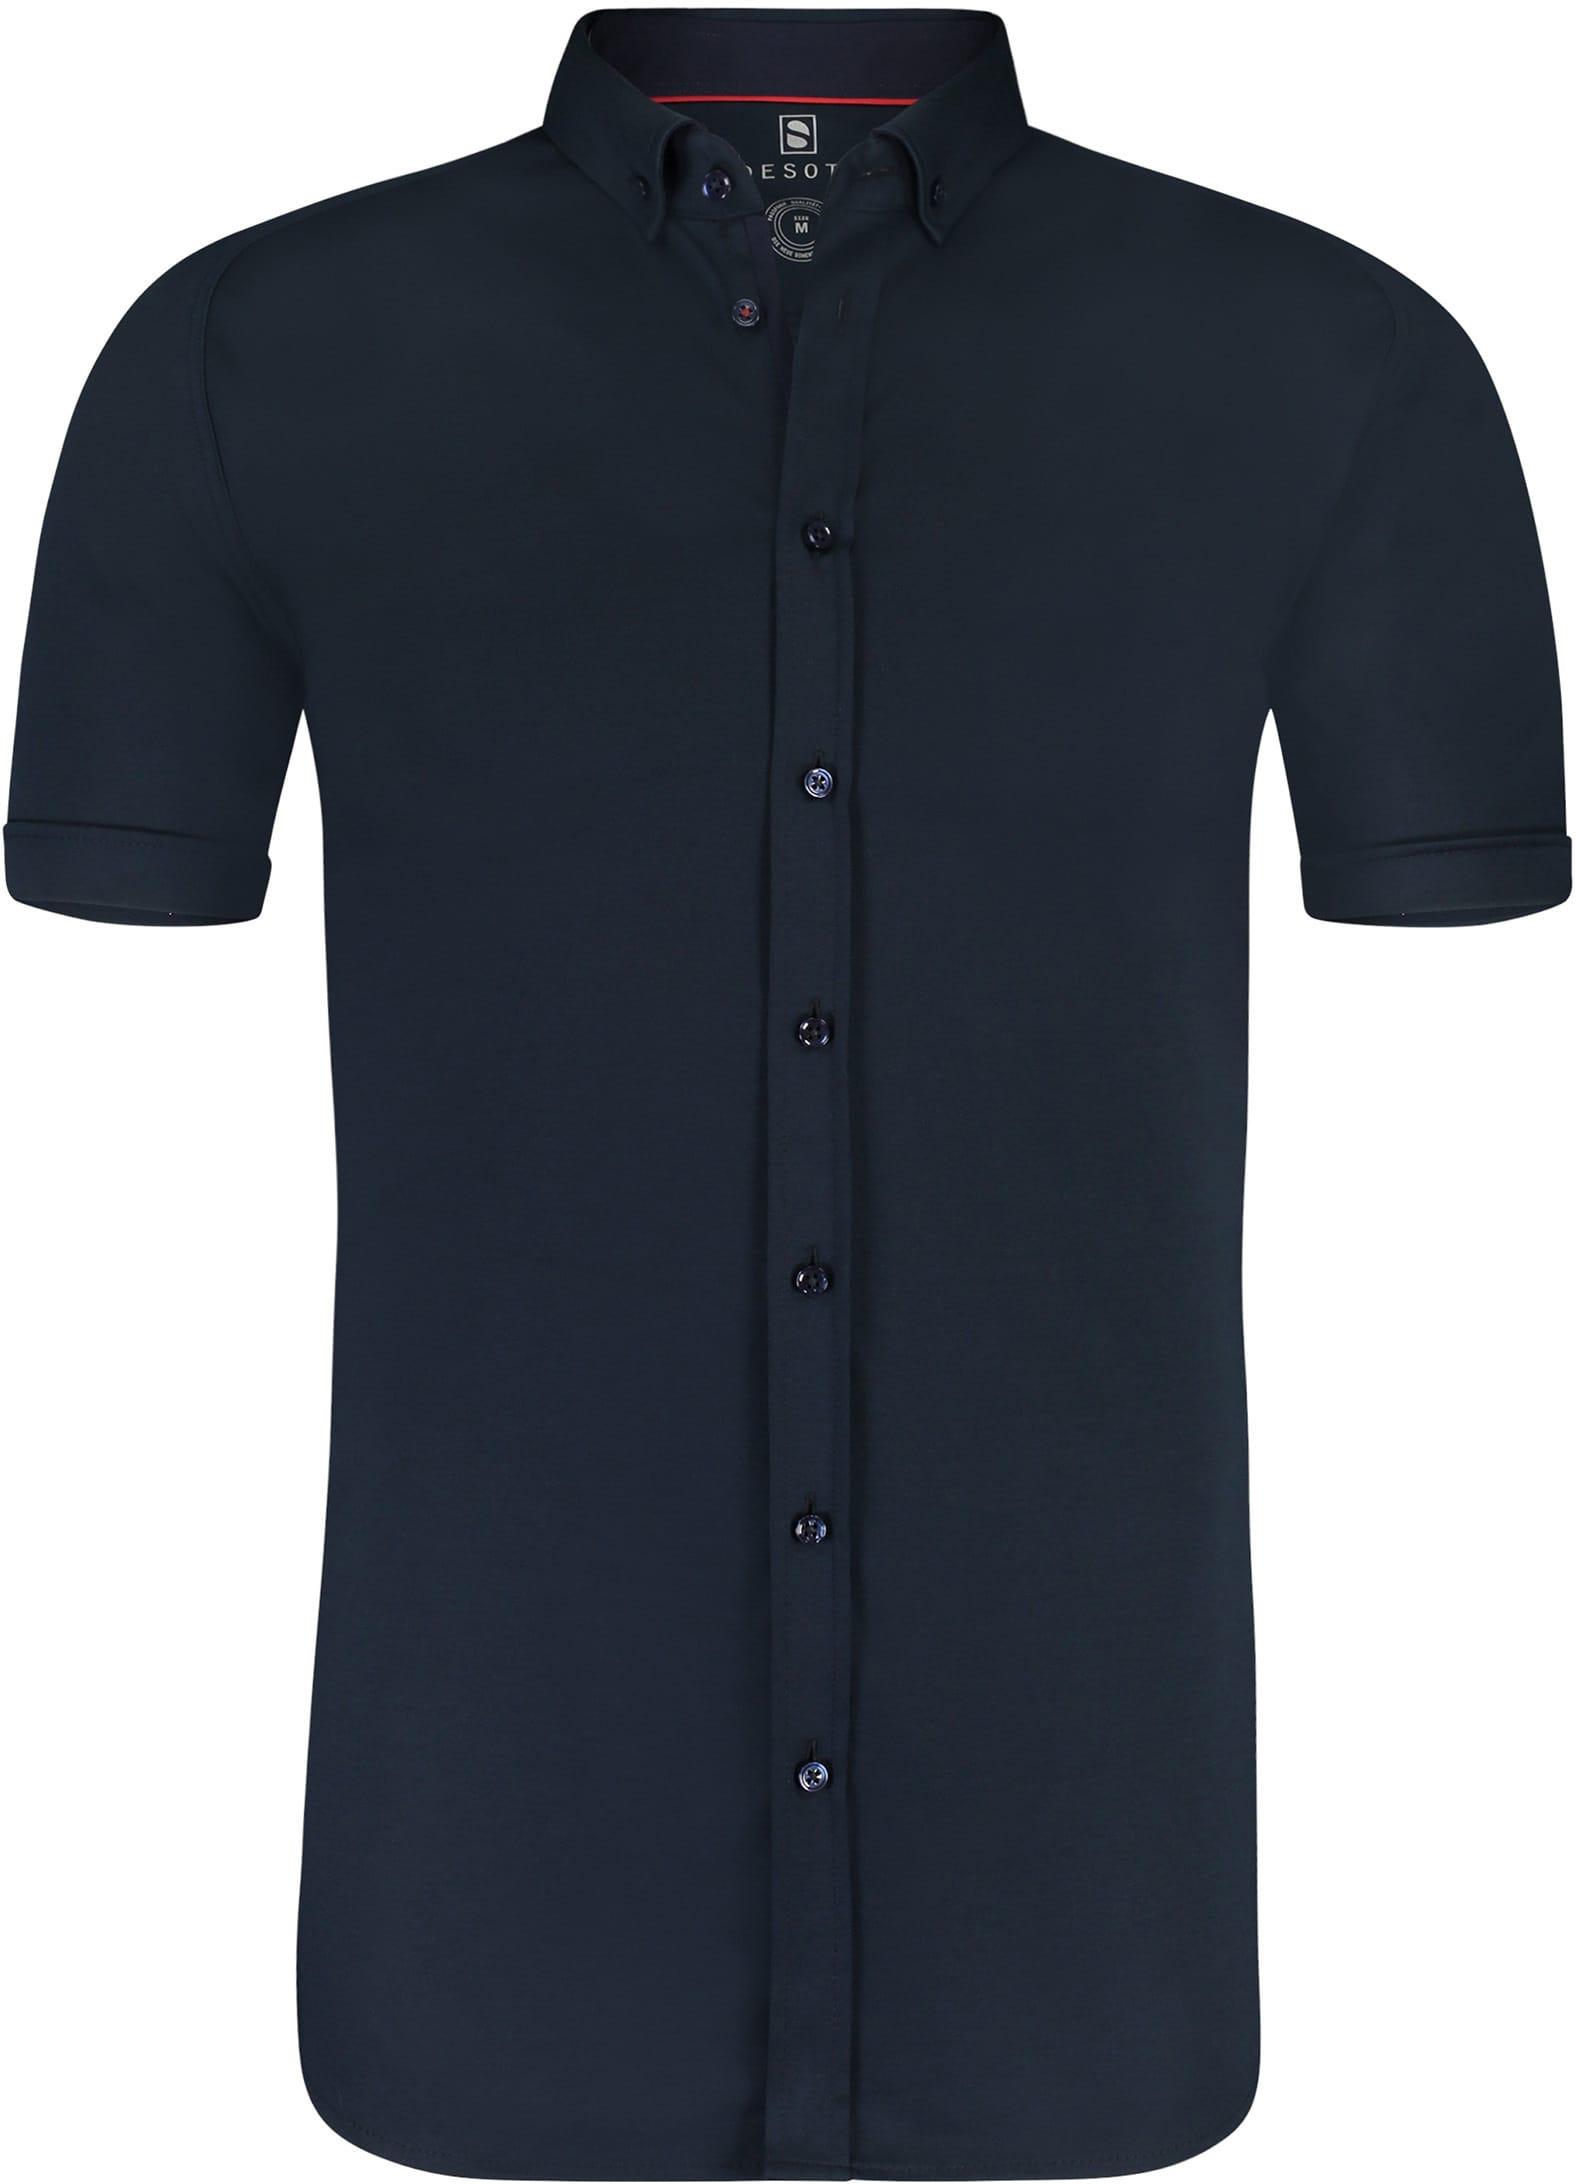 Desoto Overhemd Korte Mouw Navy foto 0